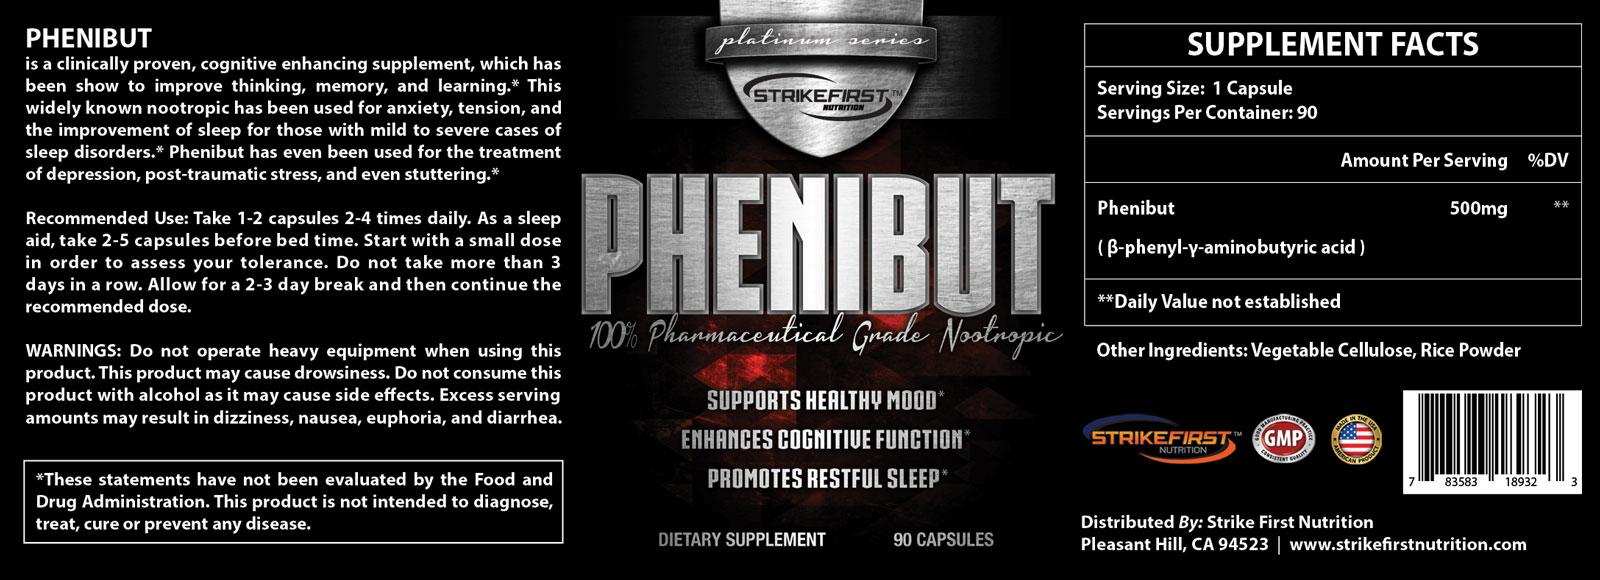 PHENIBUT: SFN™ - PHENIBUT - Rest & Reovery Nootropic